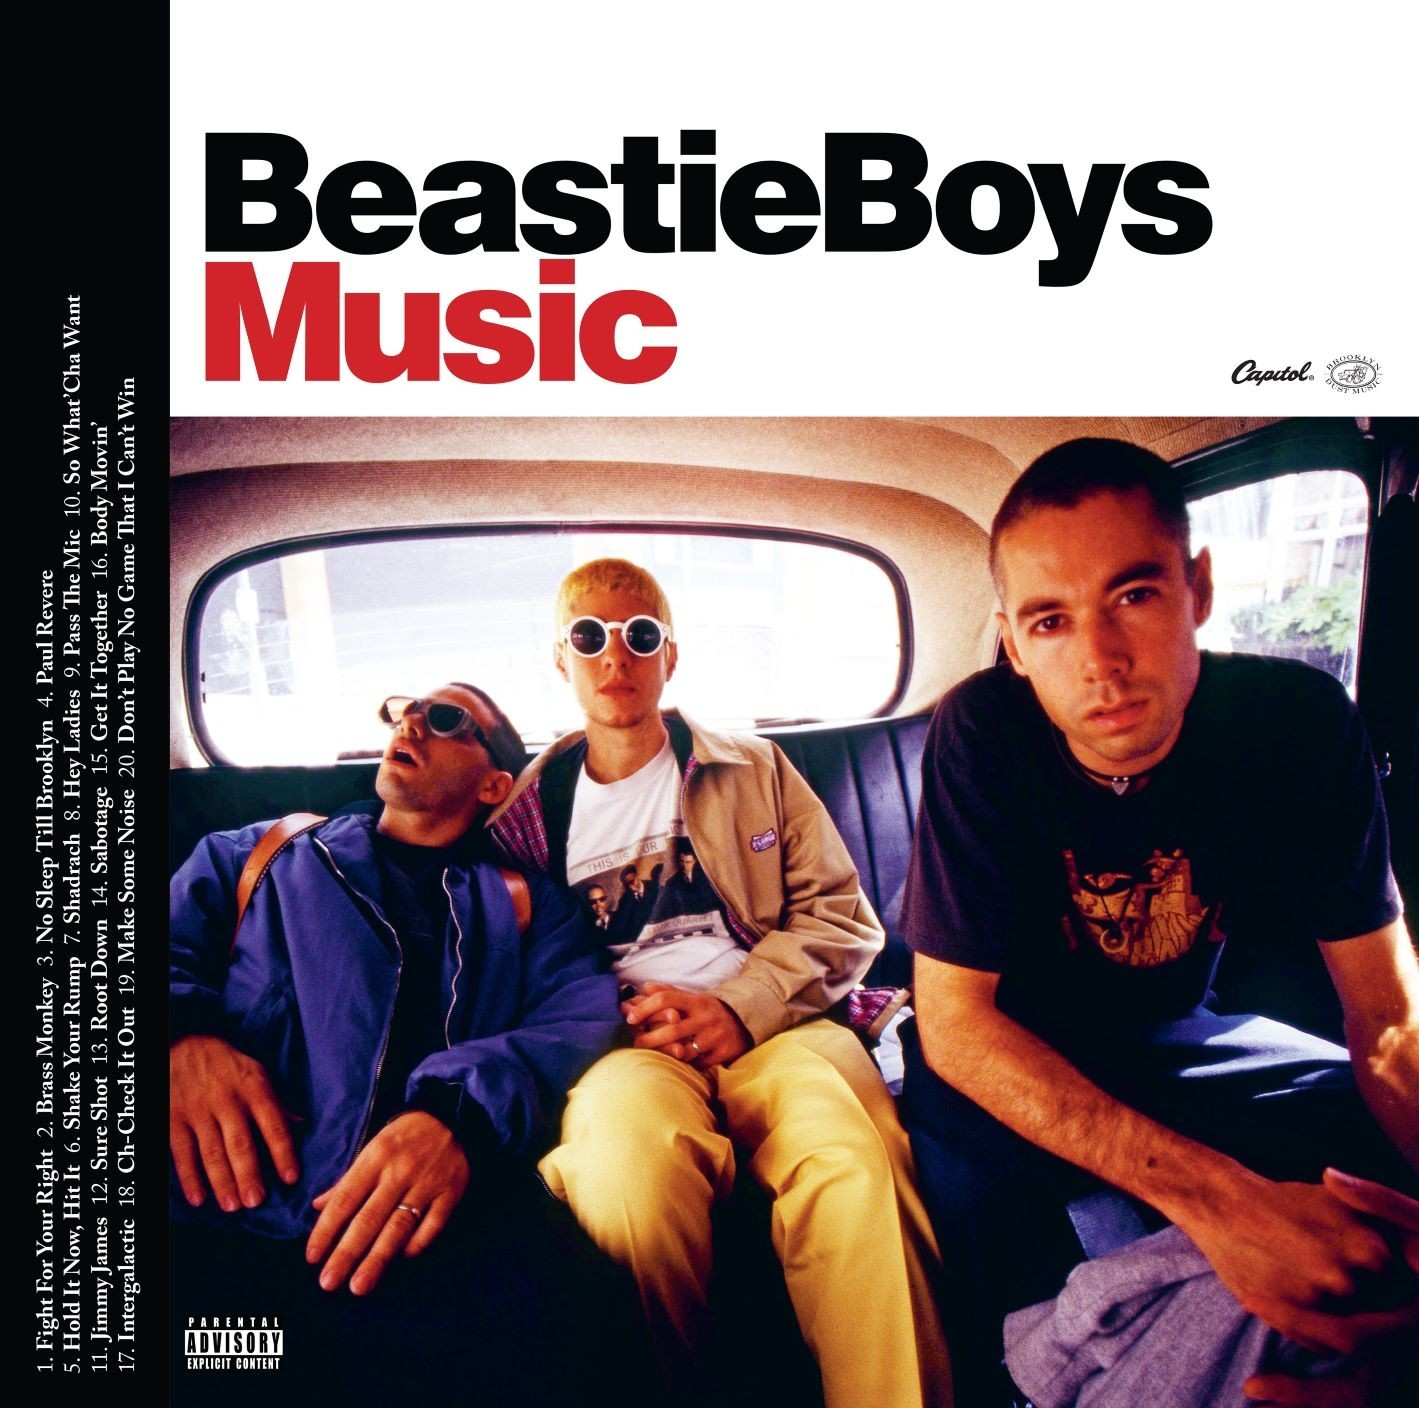 Beastie Boys - Beastie Boys Music [2XLP]